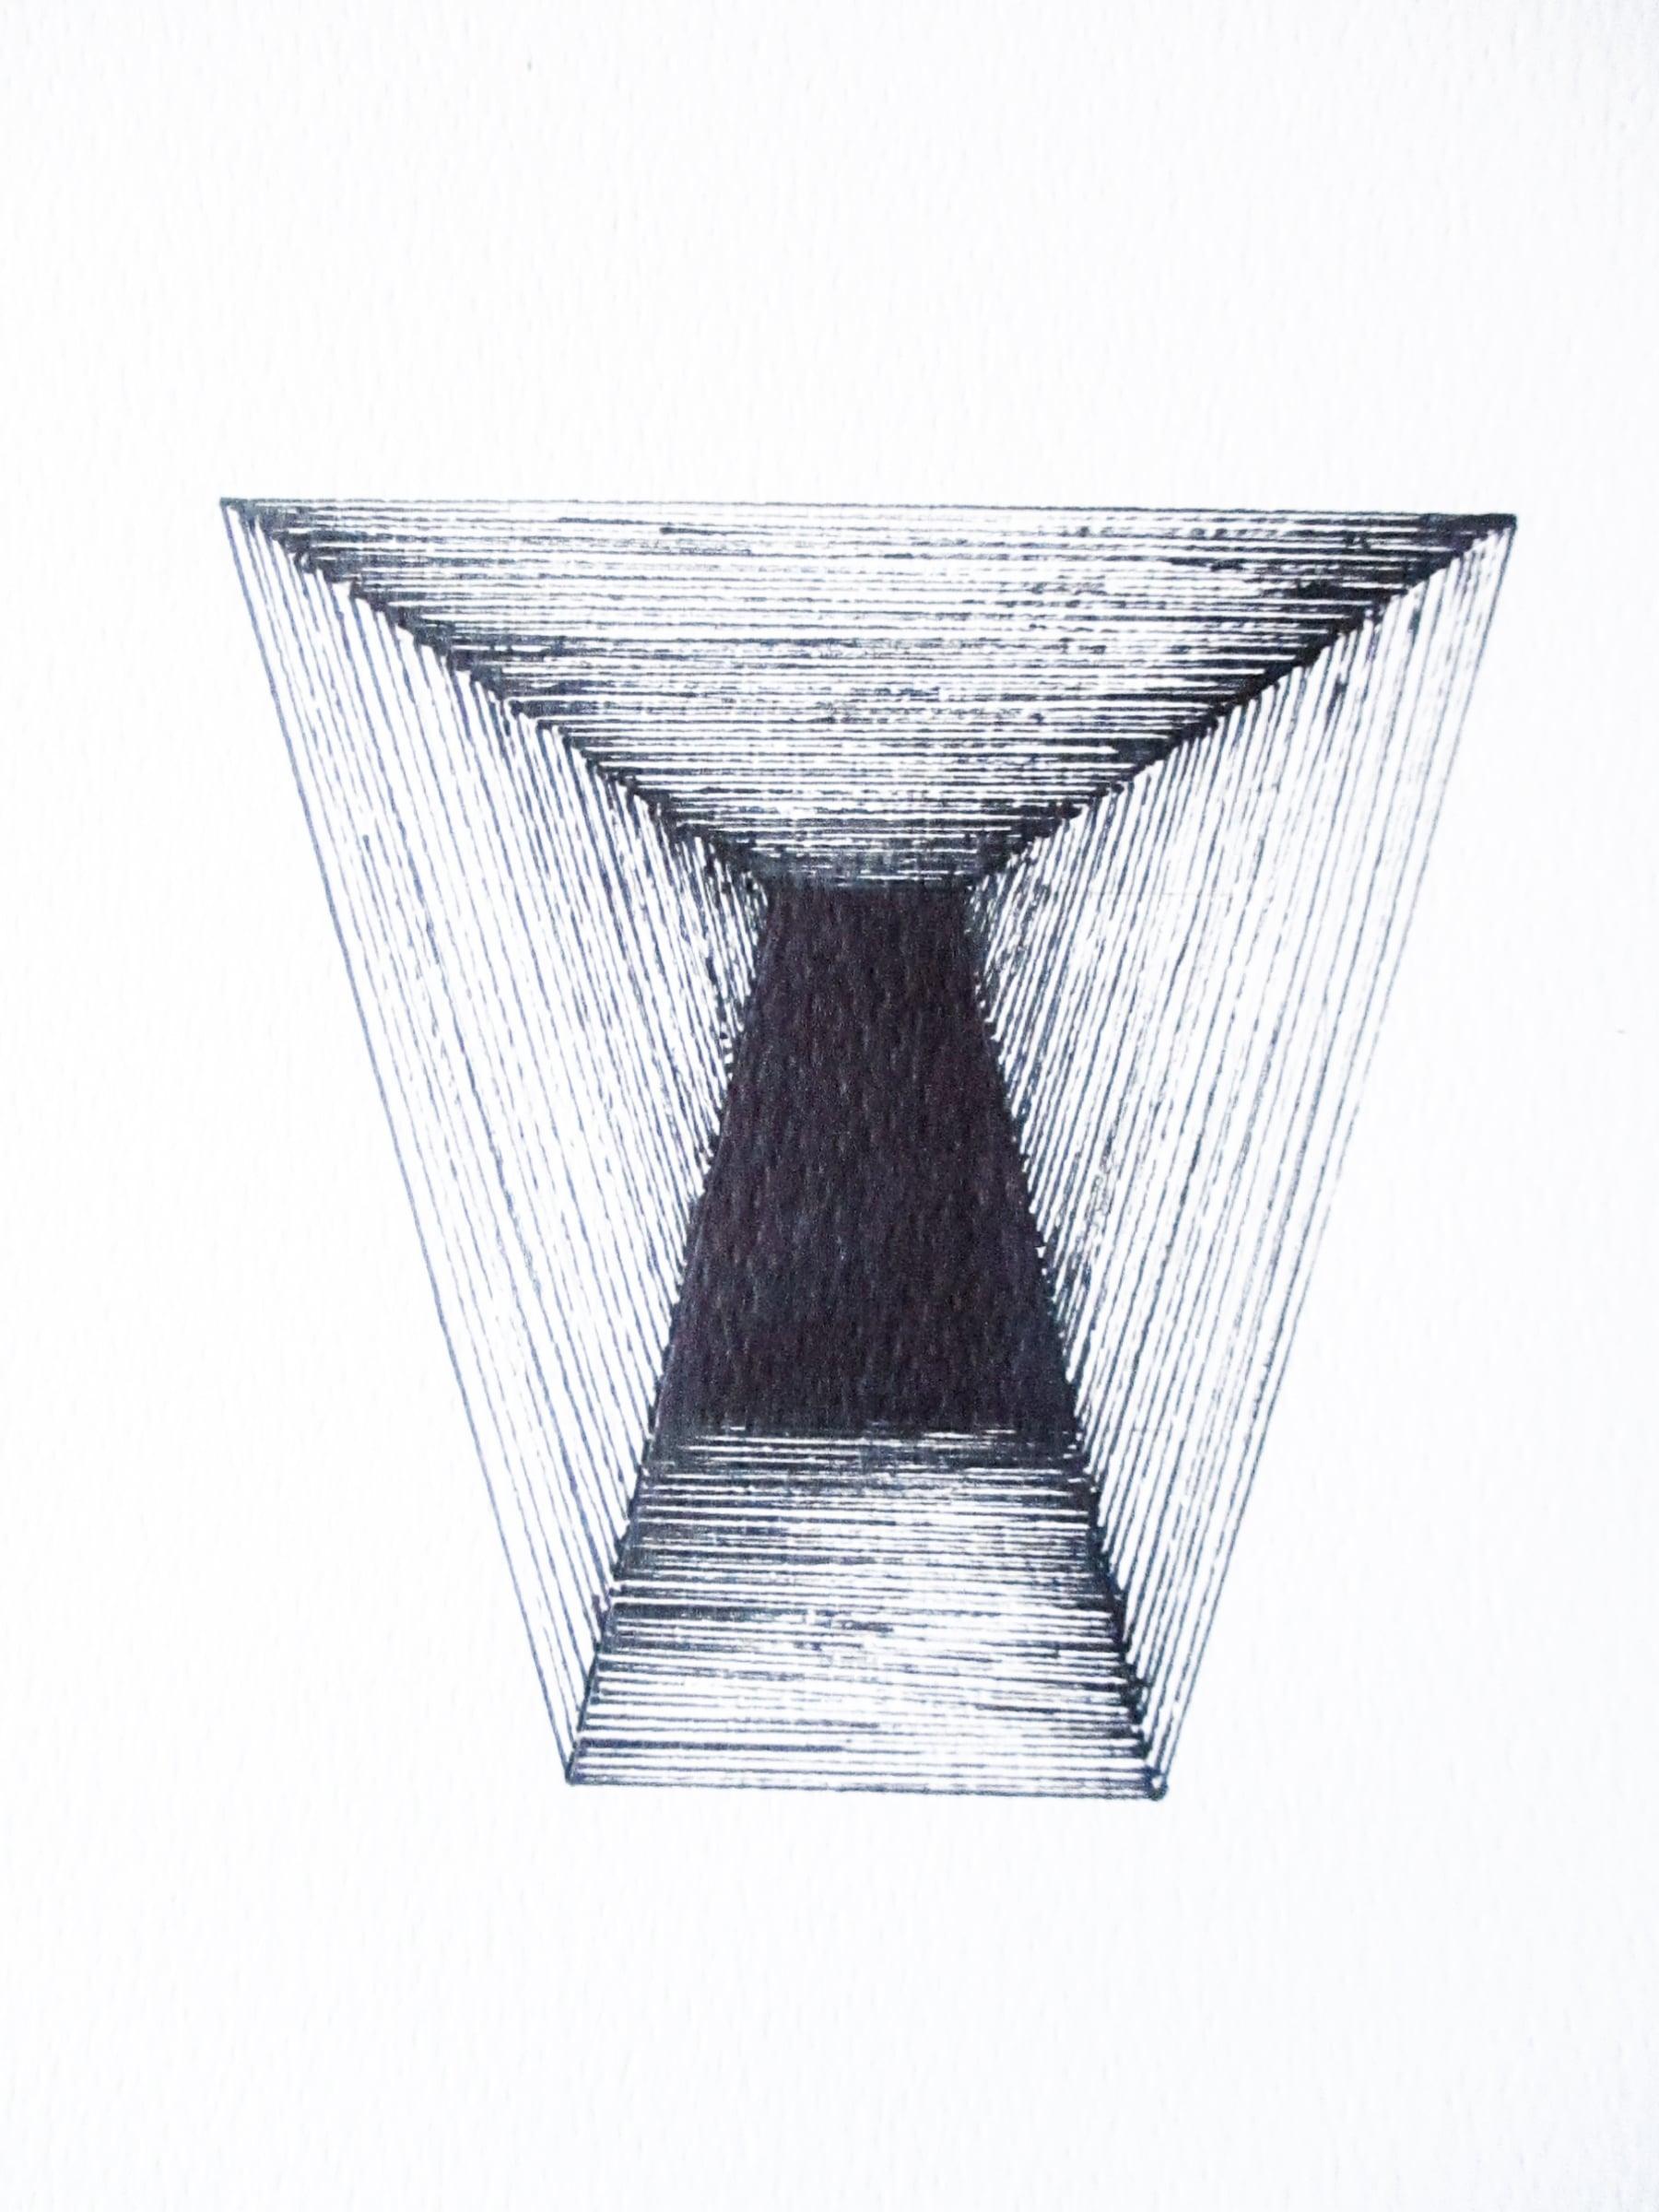 <span class=&#34;link fancybox-details-link&#34;><a href=&#34;/content/viewing-room/54/artworks2316/&#34;>View Detail Page</a></span><div class=&#34;medium&#34;>Ink On Watercolour Paper</div> <div class=&#34;dimensions&#34;>21cm x 14.8cm</div>